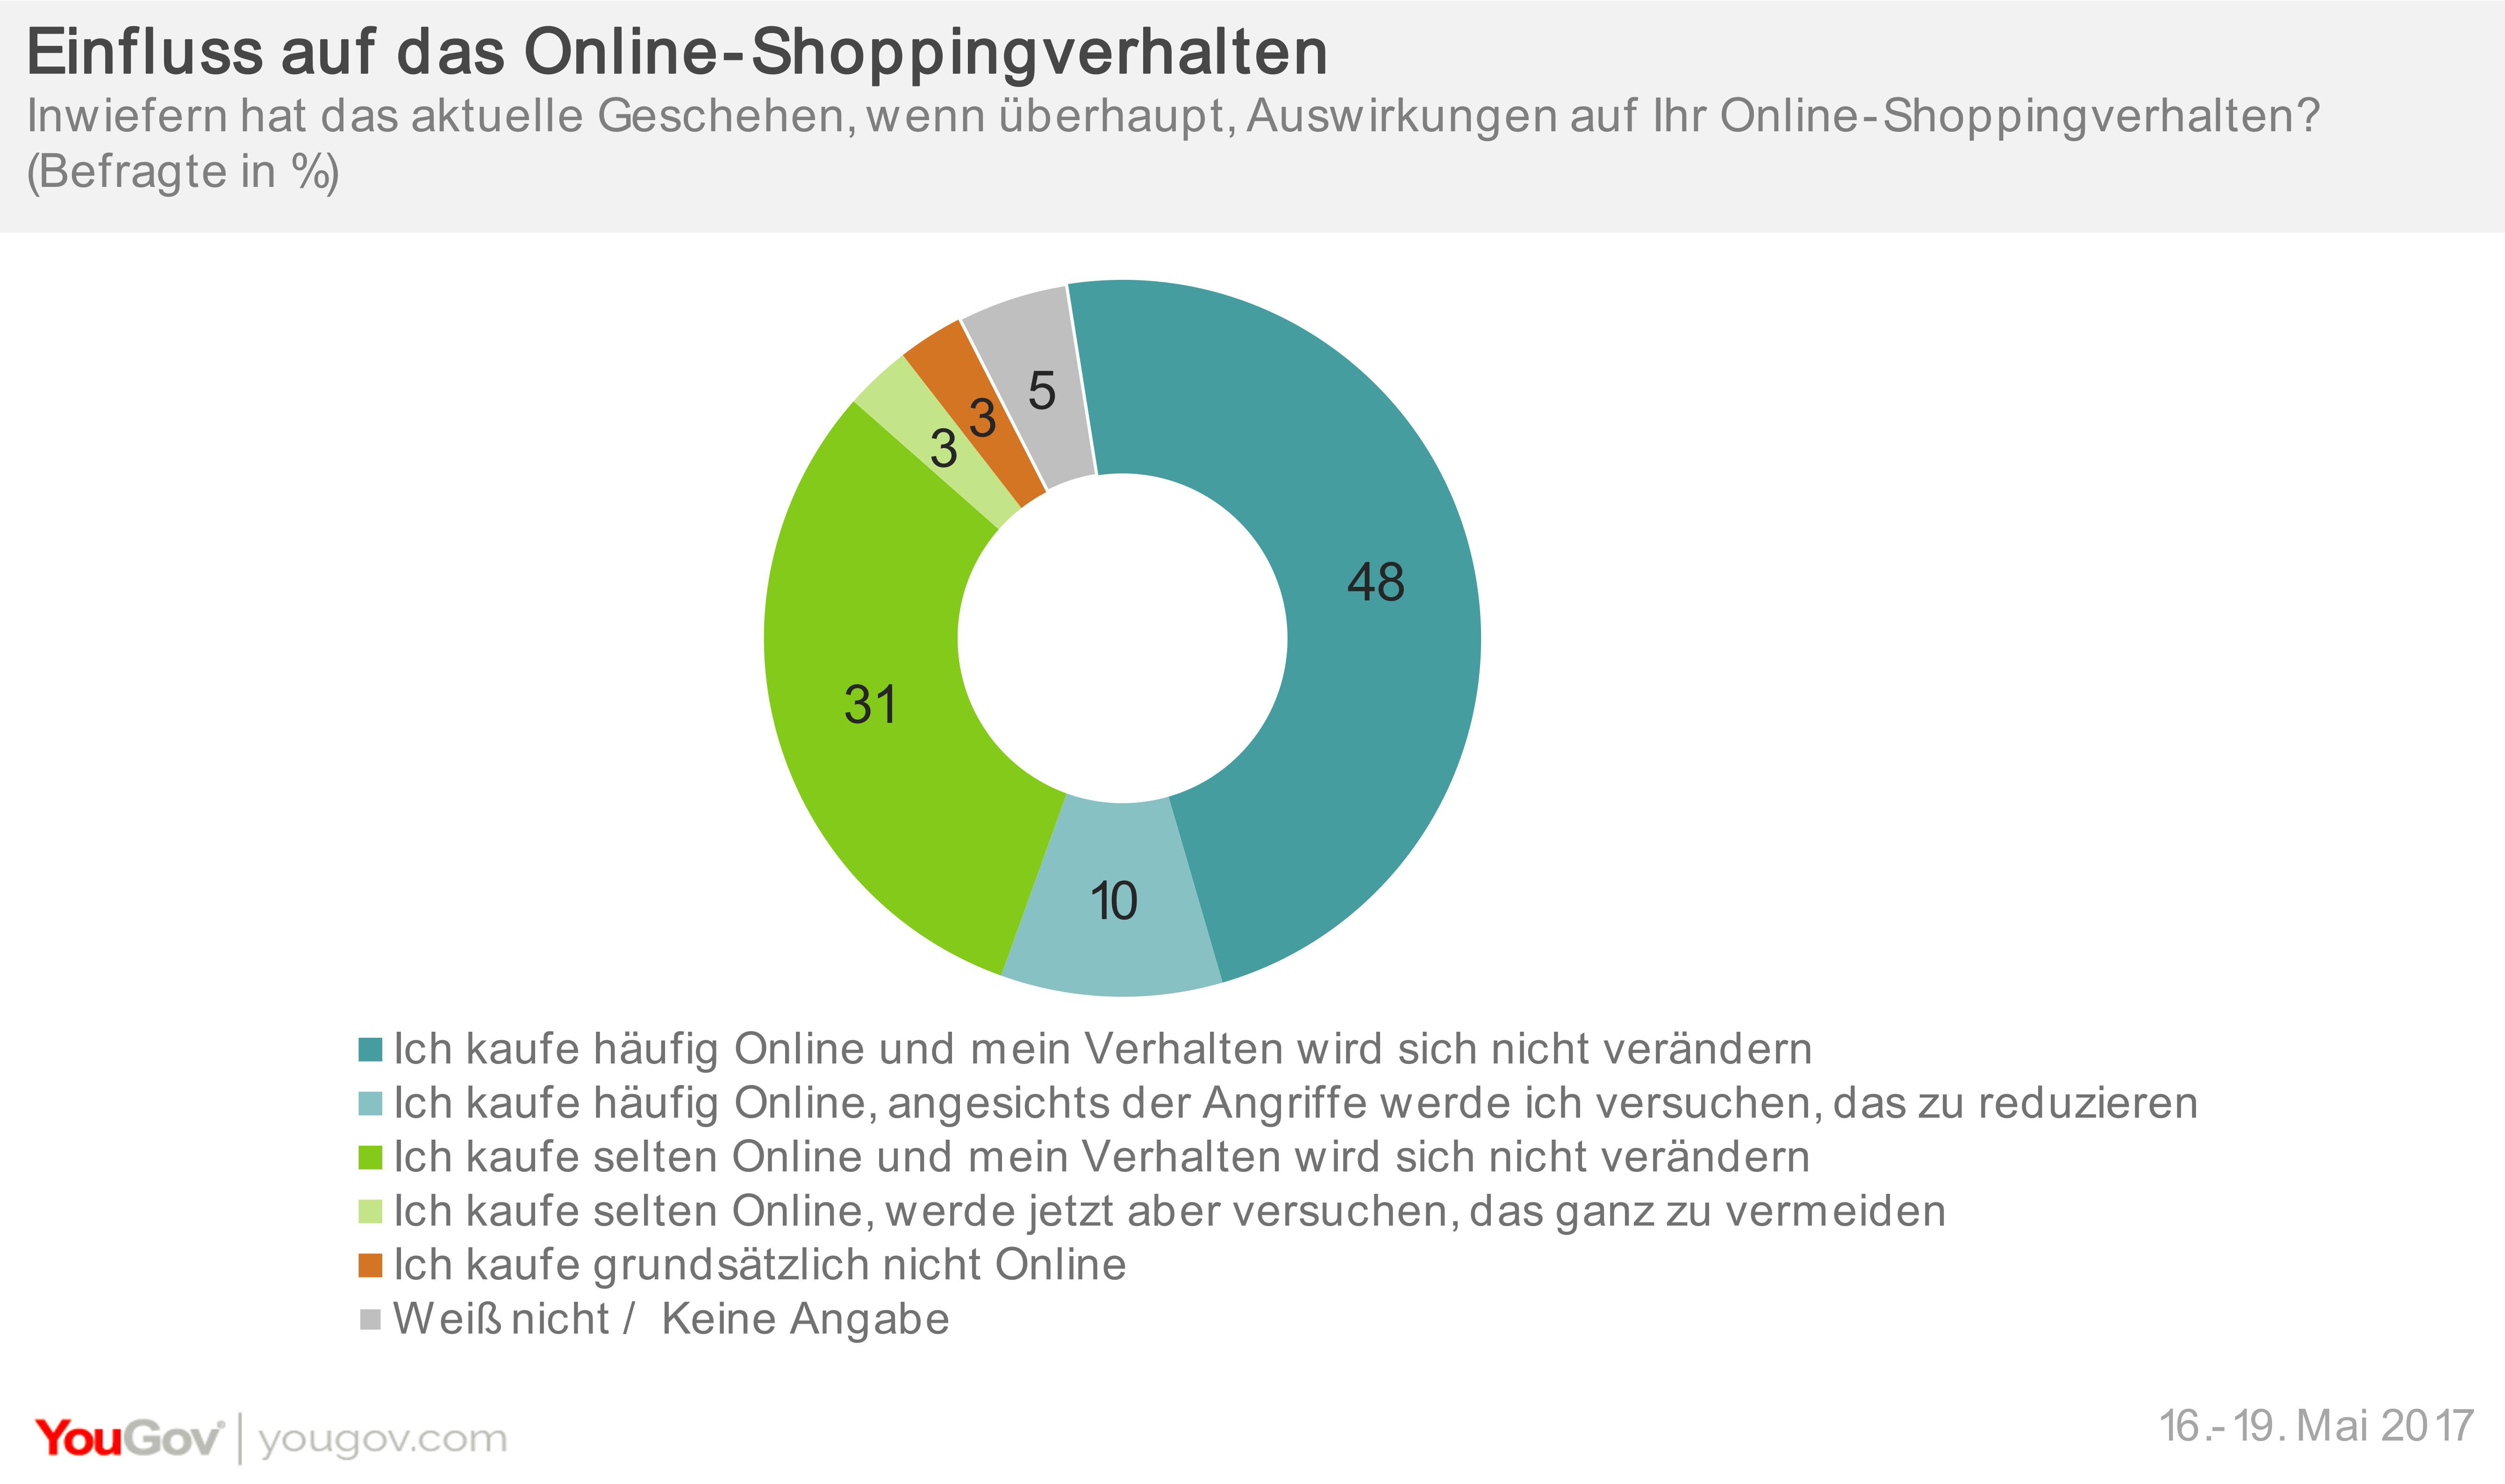 Online-Shopping trotz Cyber-Risiken